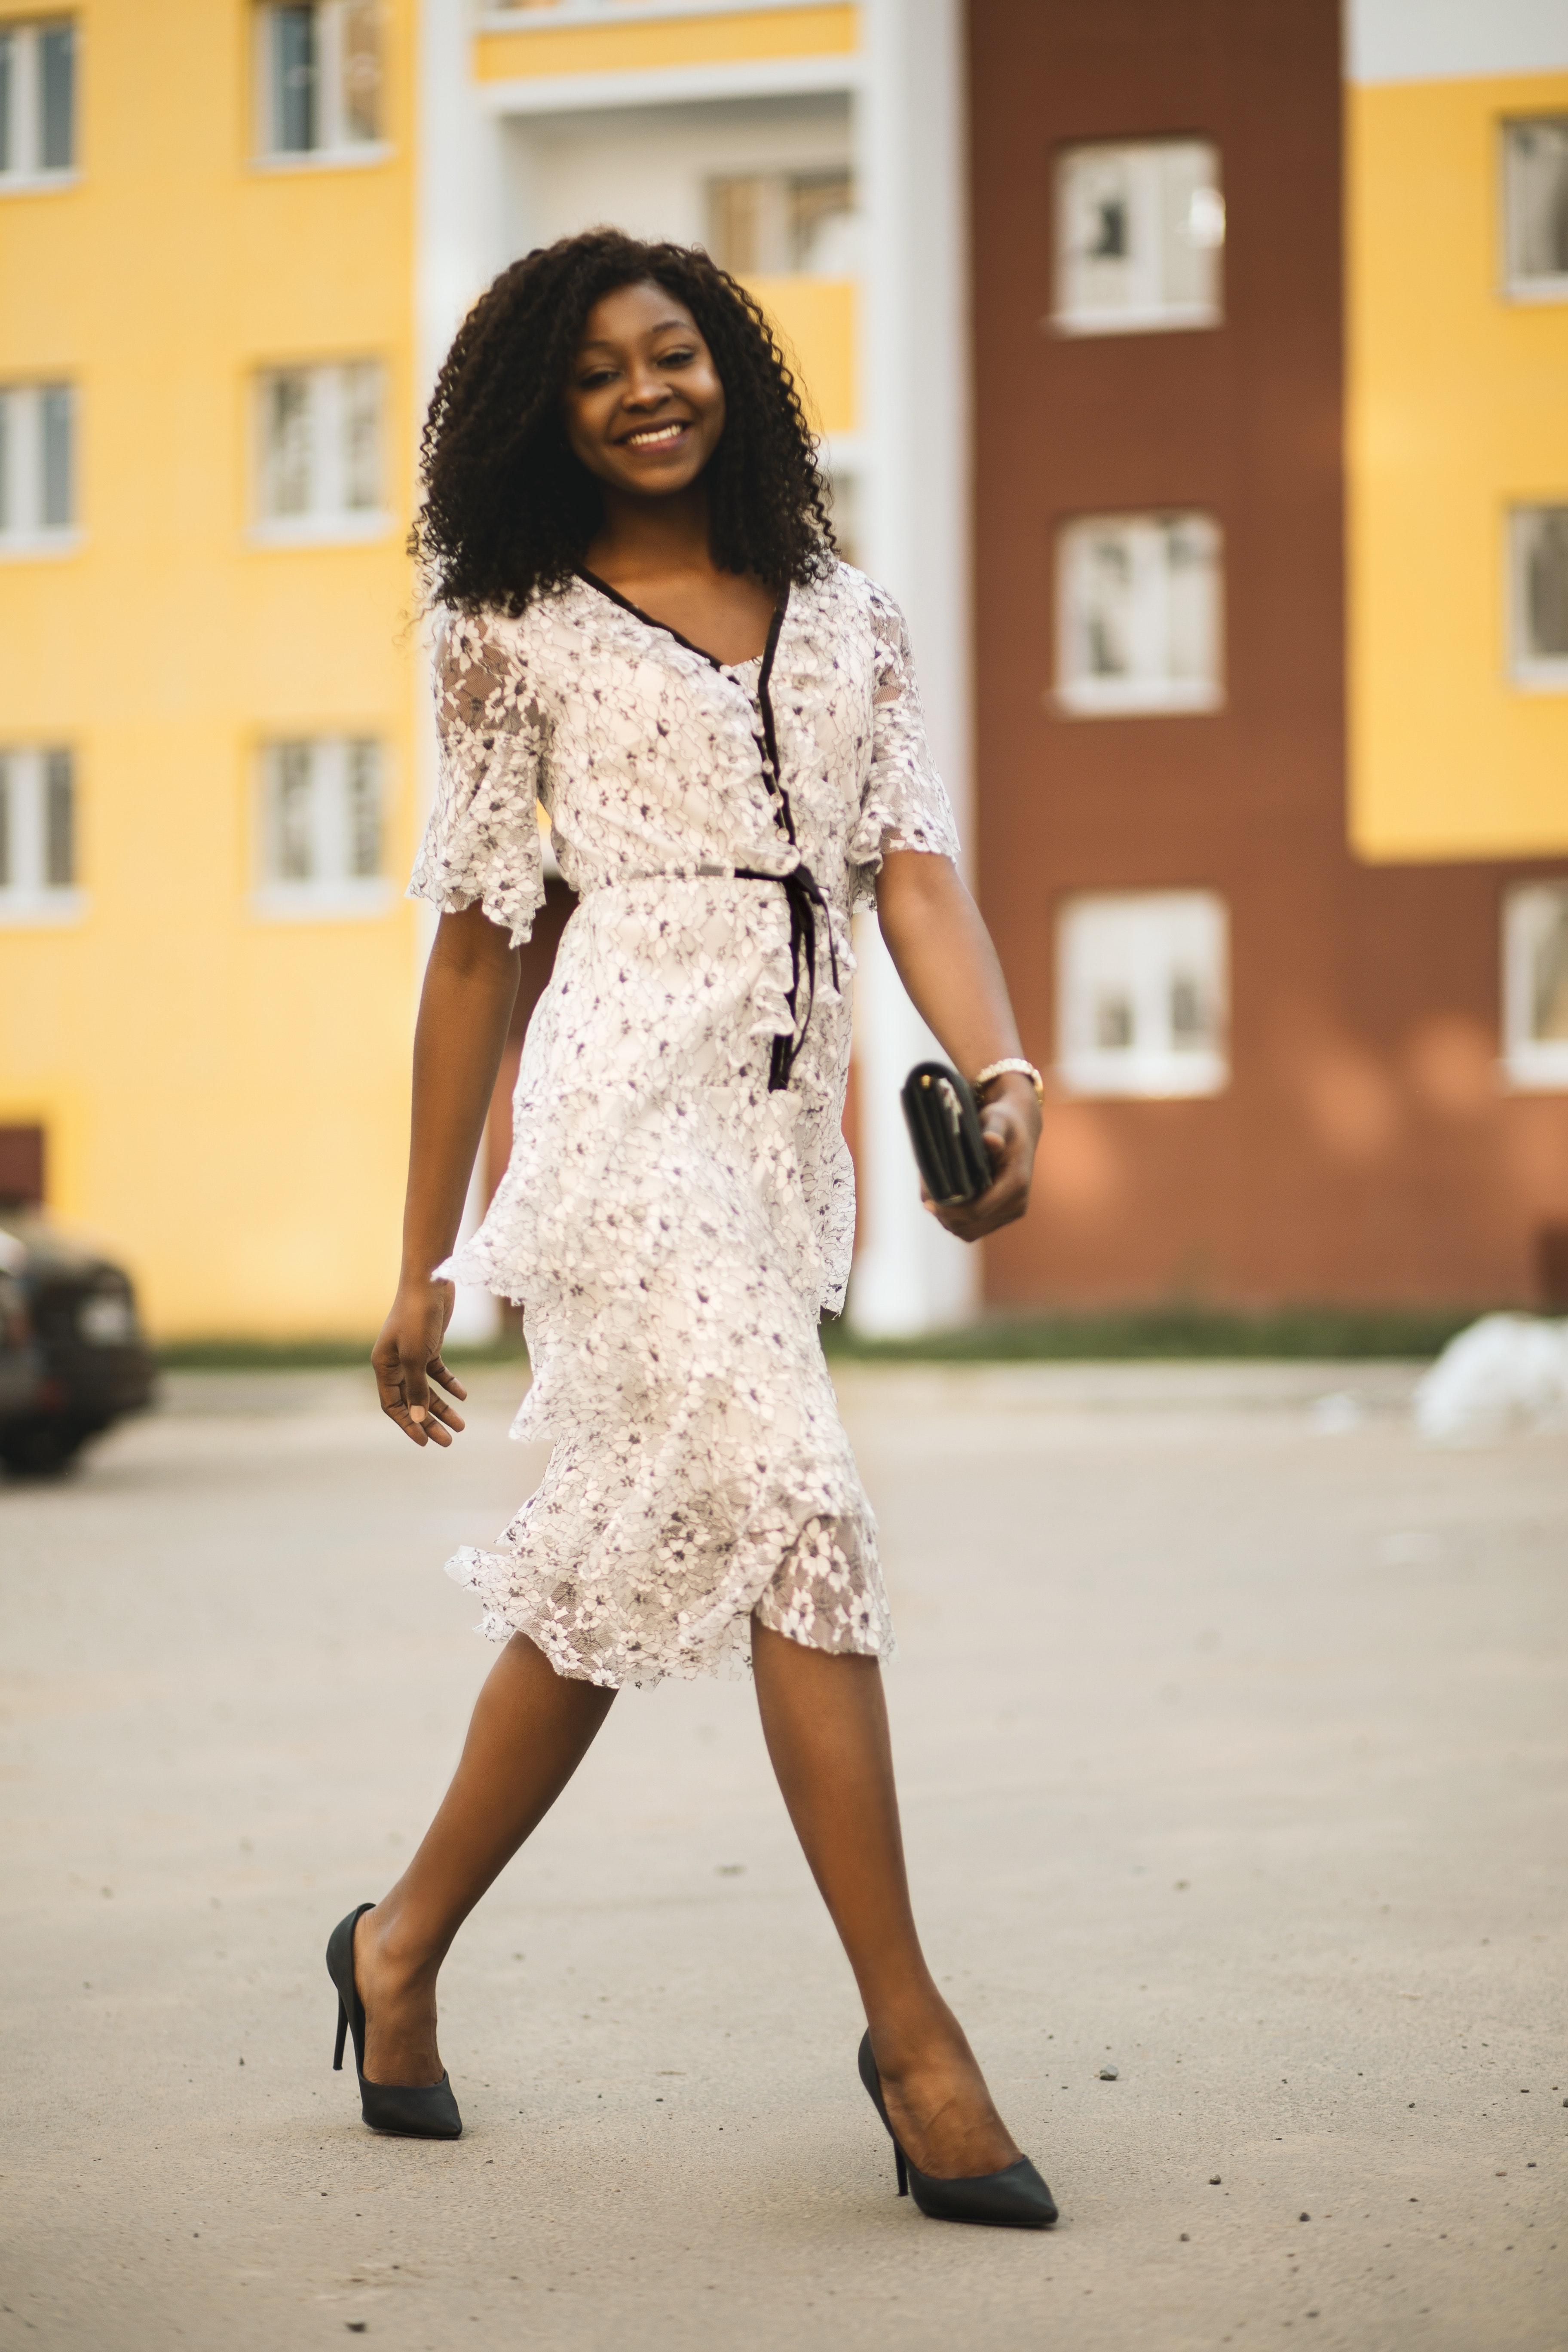 074d8b79c Smiling Woman Wearing White Dress · Free Stock Photo